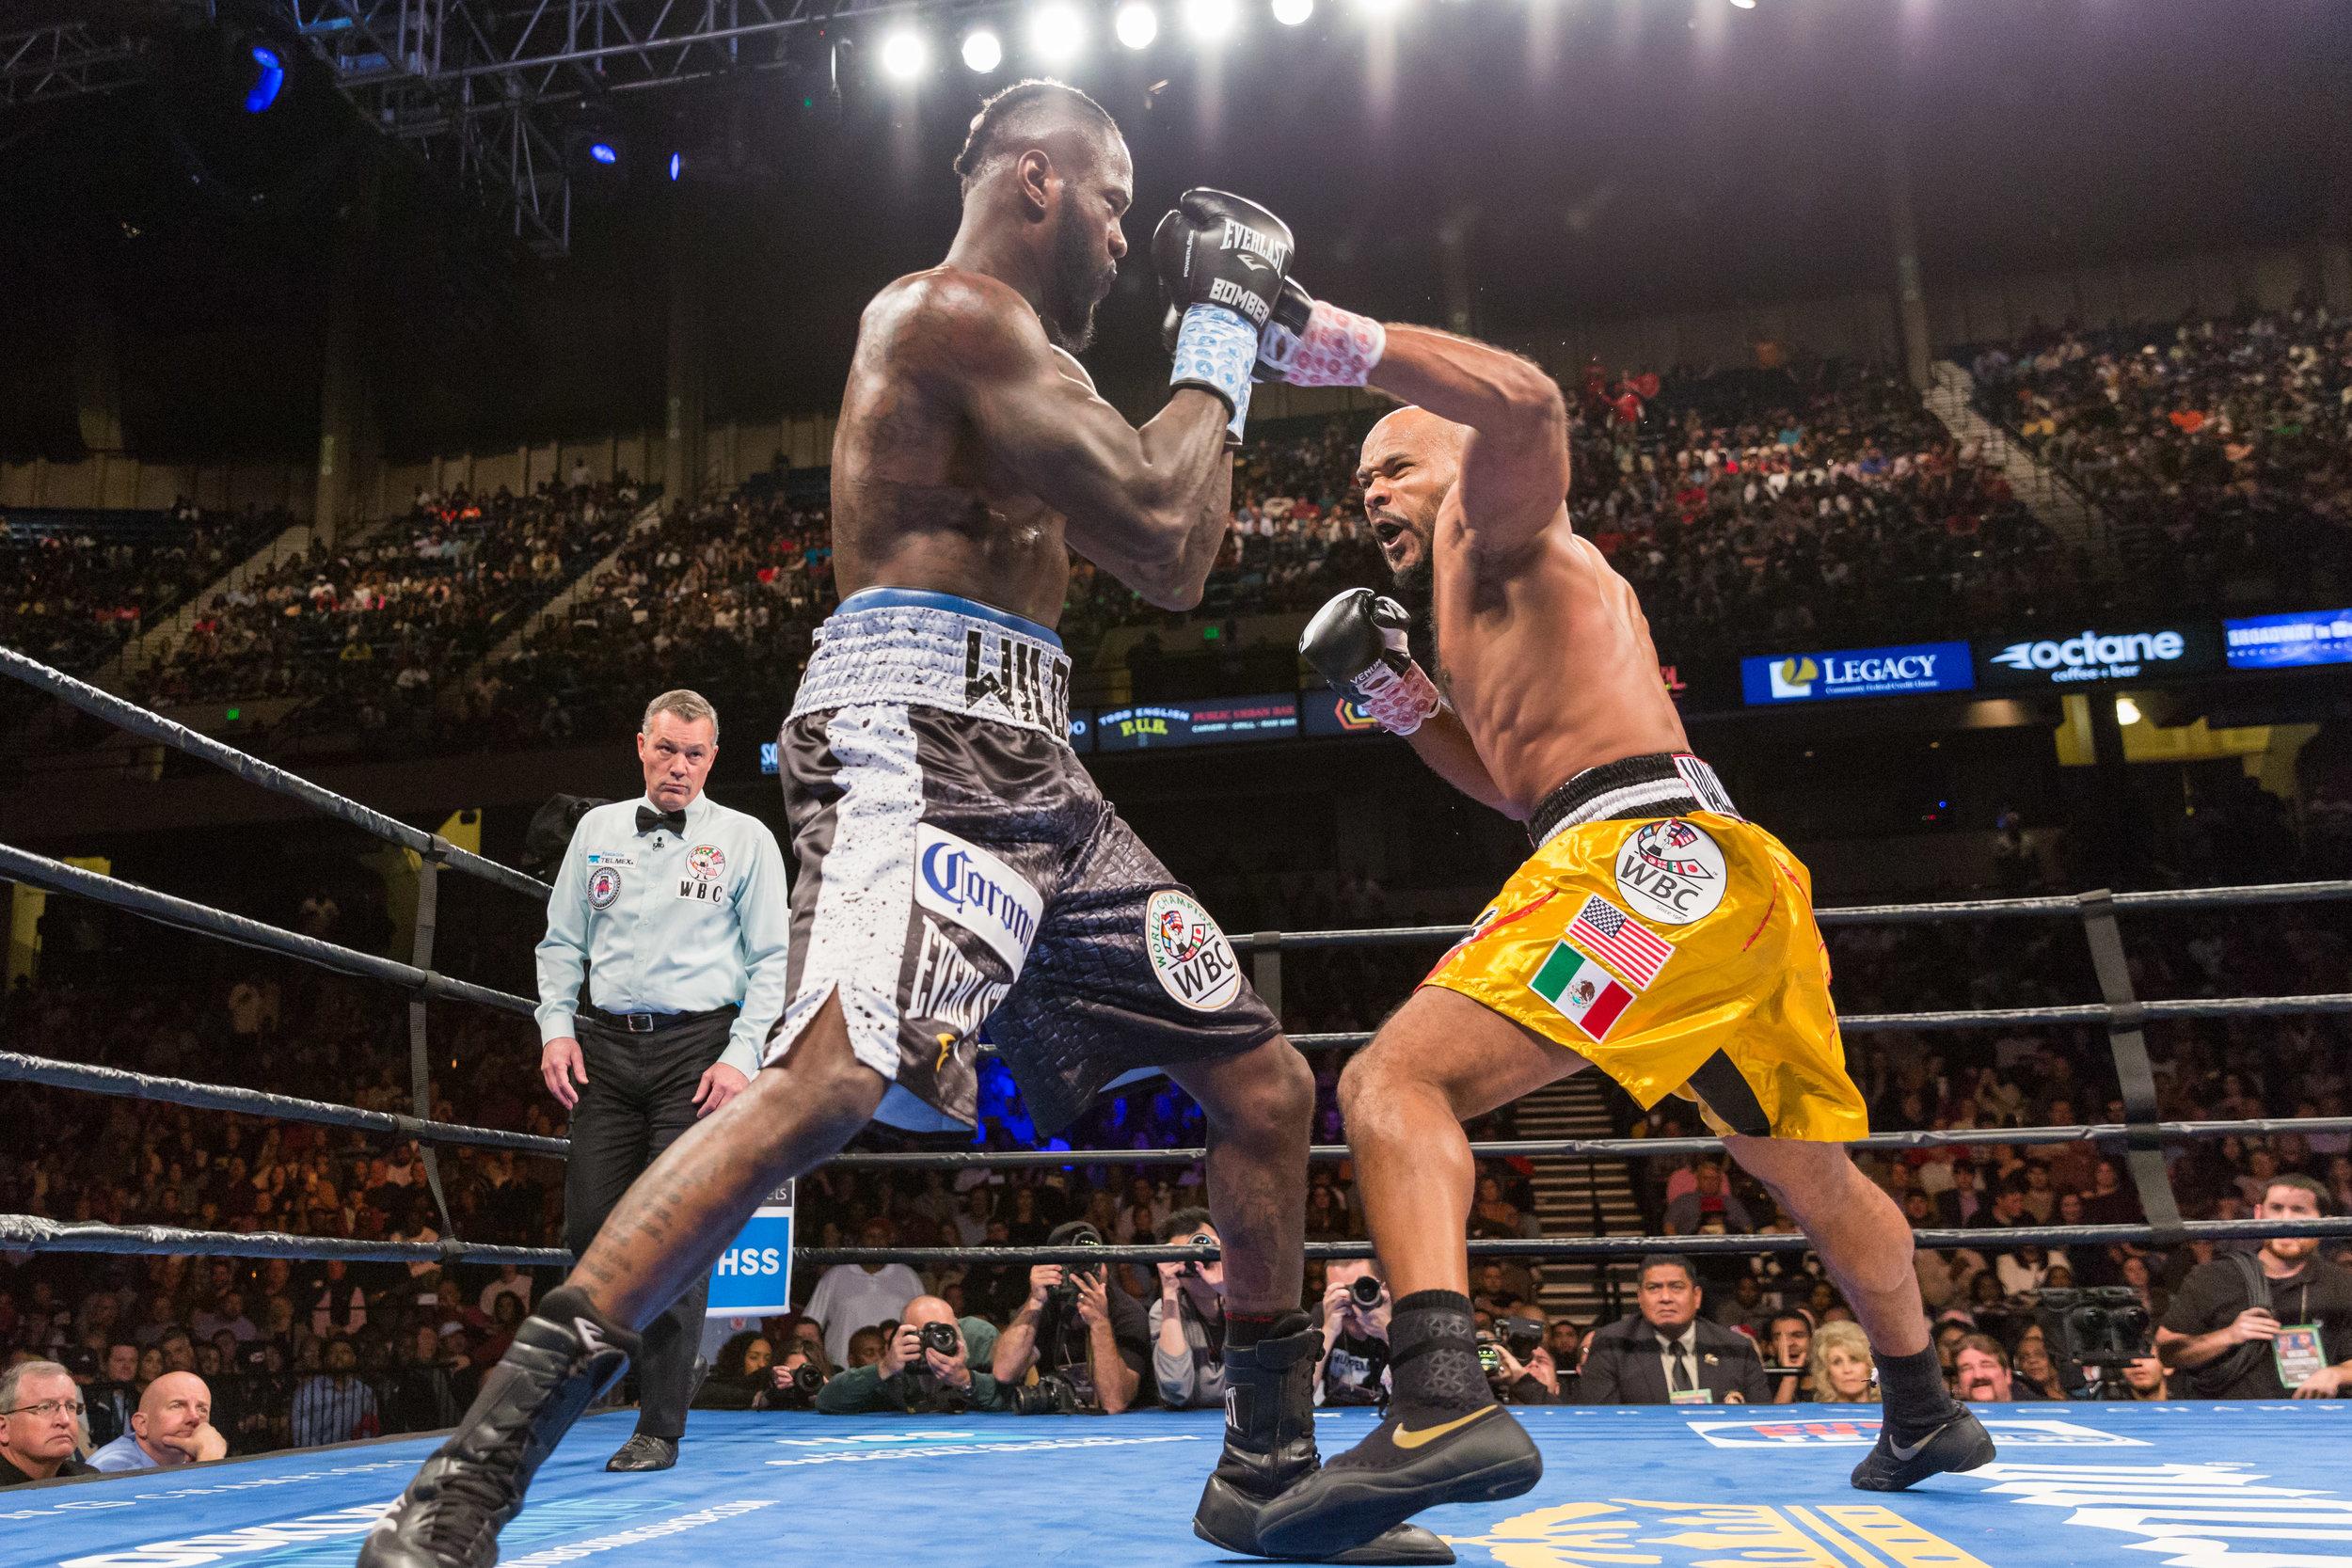 Deontay Wilder vs Gerald Washington - February 25_ 2017_02_25_2017_Fight_Ryan Hafey _ Premier Boxing Champions7.jpg